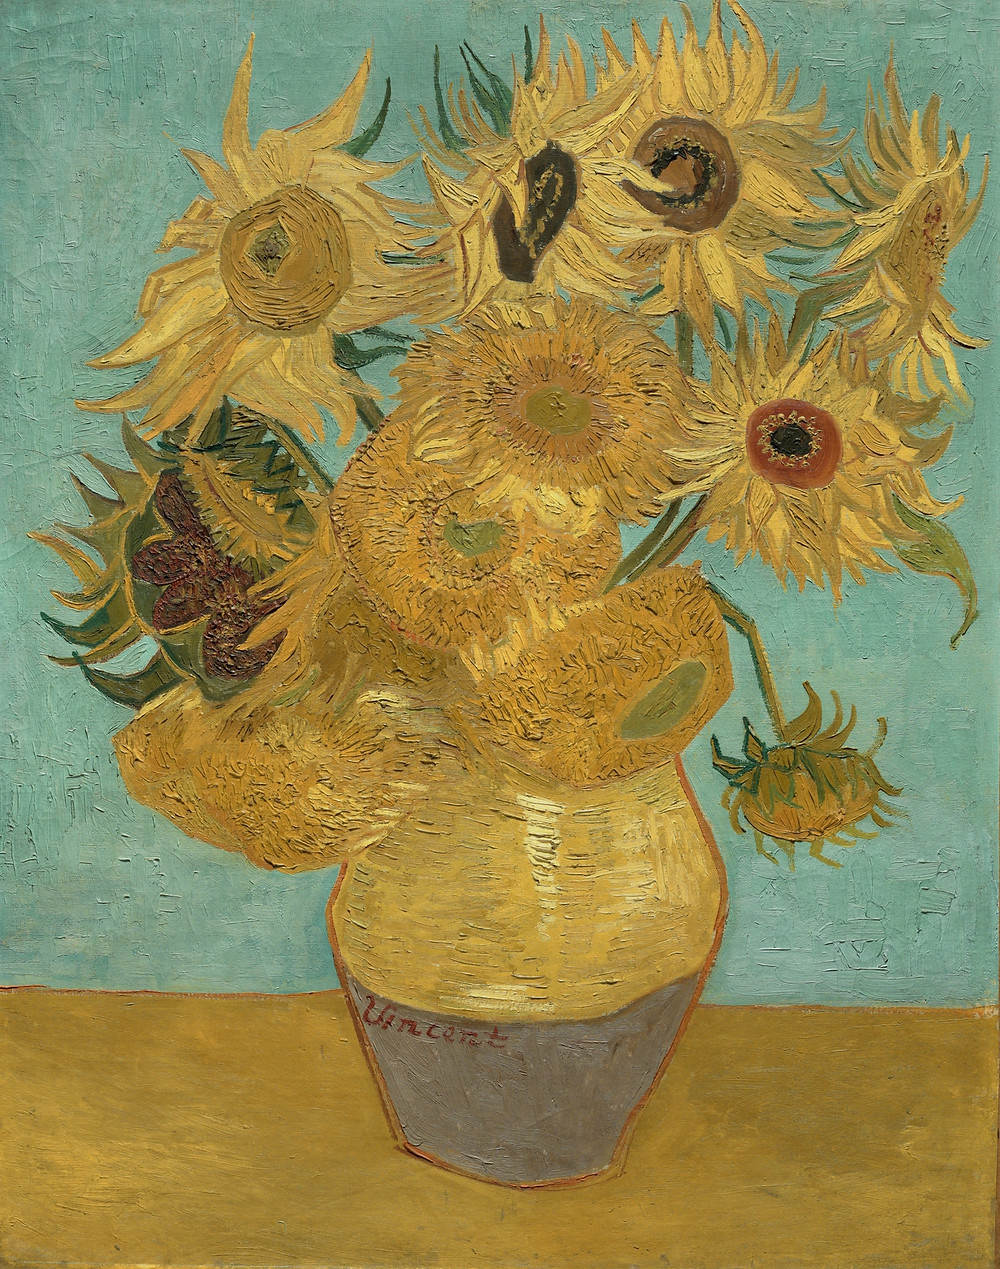 Van Gogh, Sunflowers, 1988-89